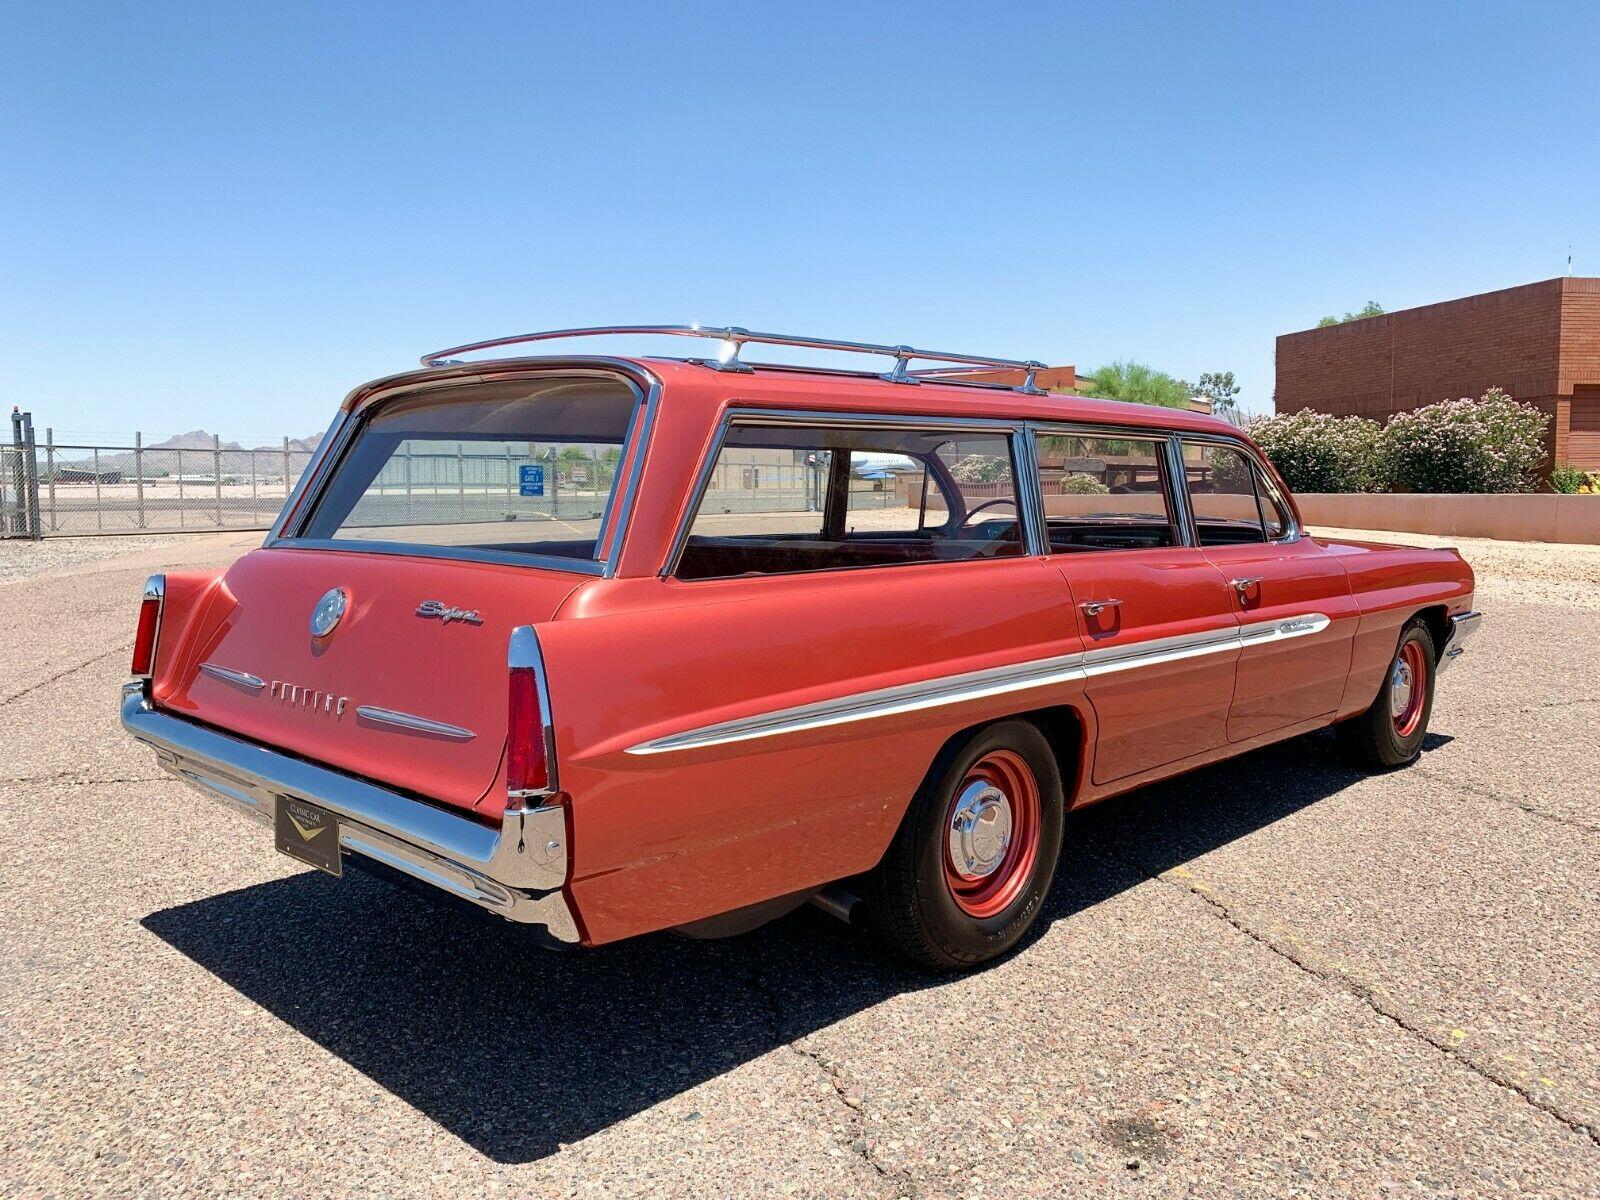 Money No Object: 1961 Pontiac Catalina Safari with 389 Tri-Power